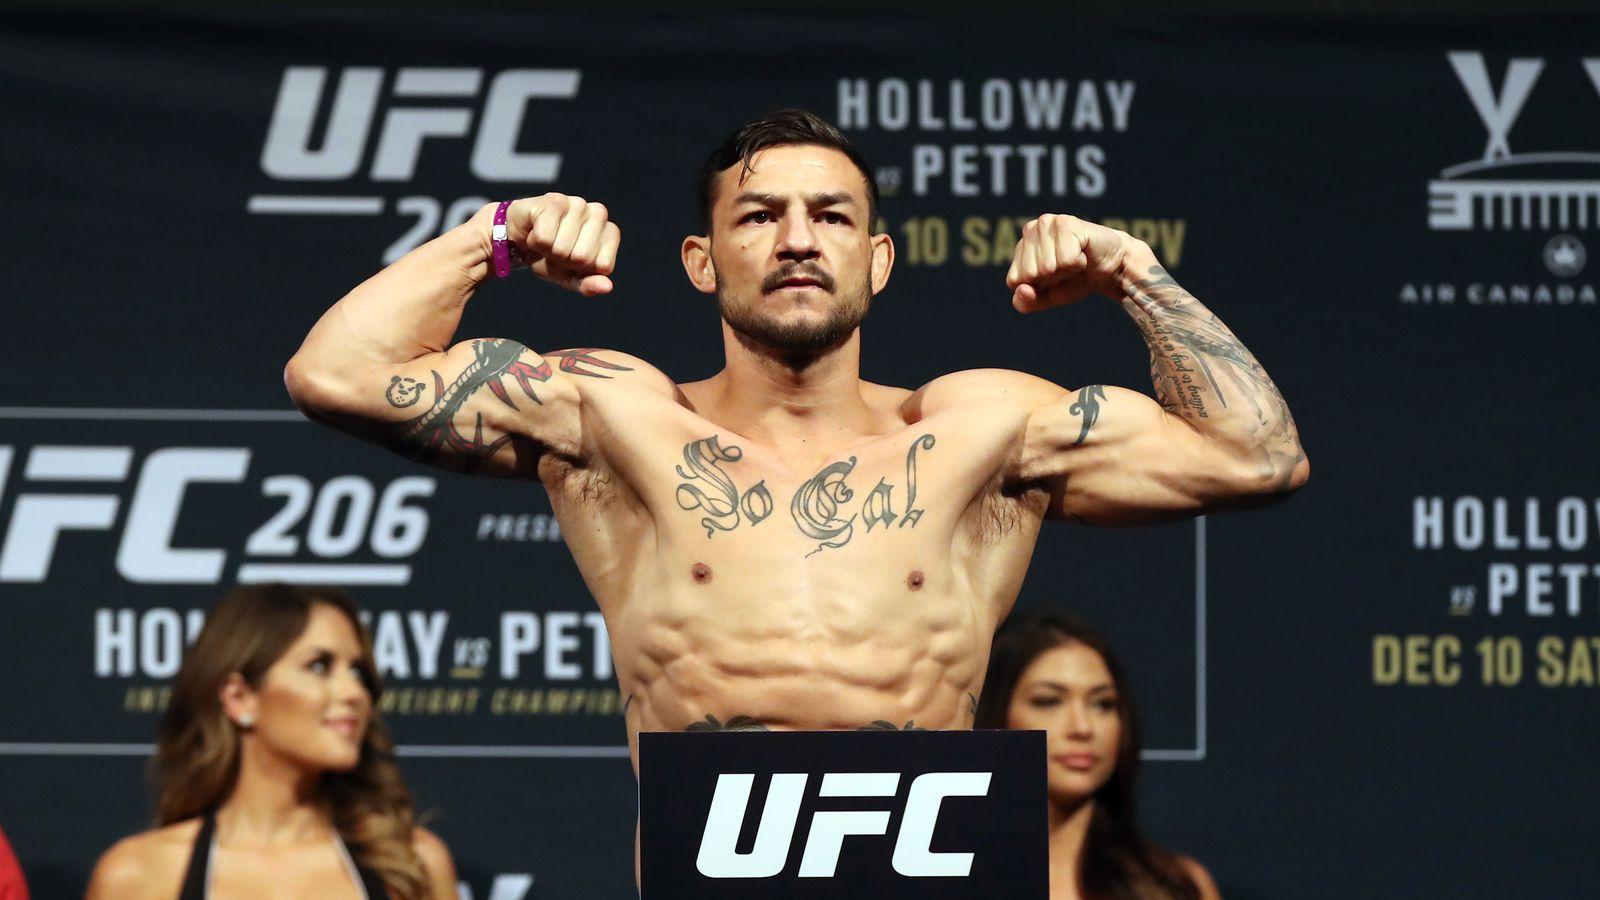 UFC 206   s Cub Swanson  I   m glad